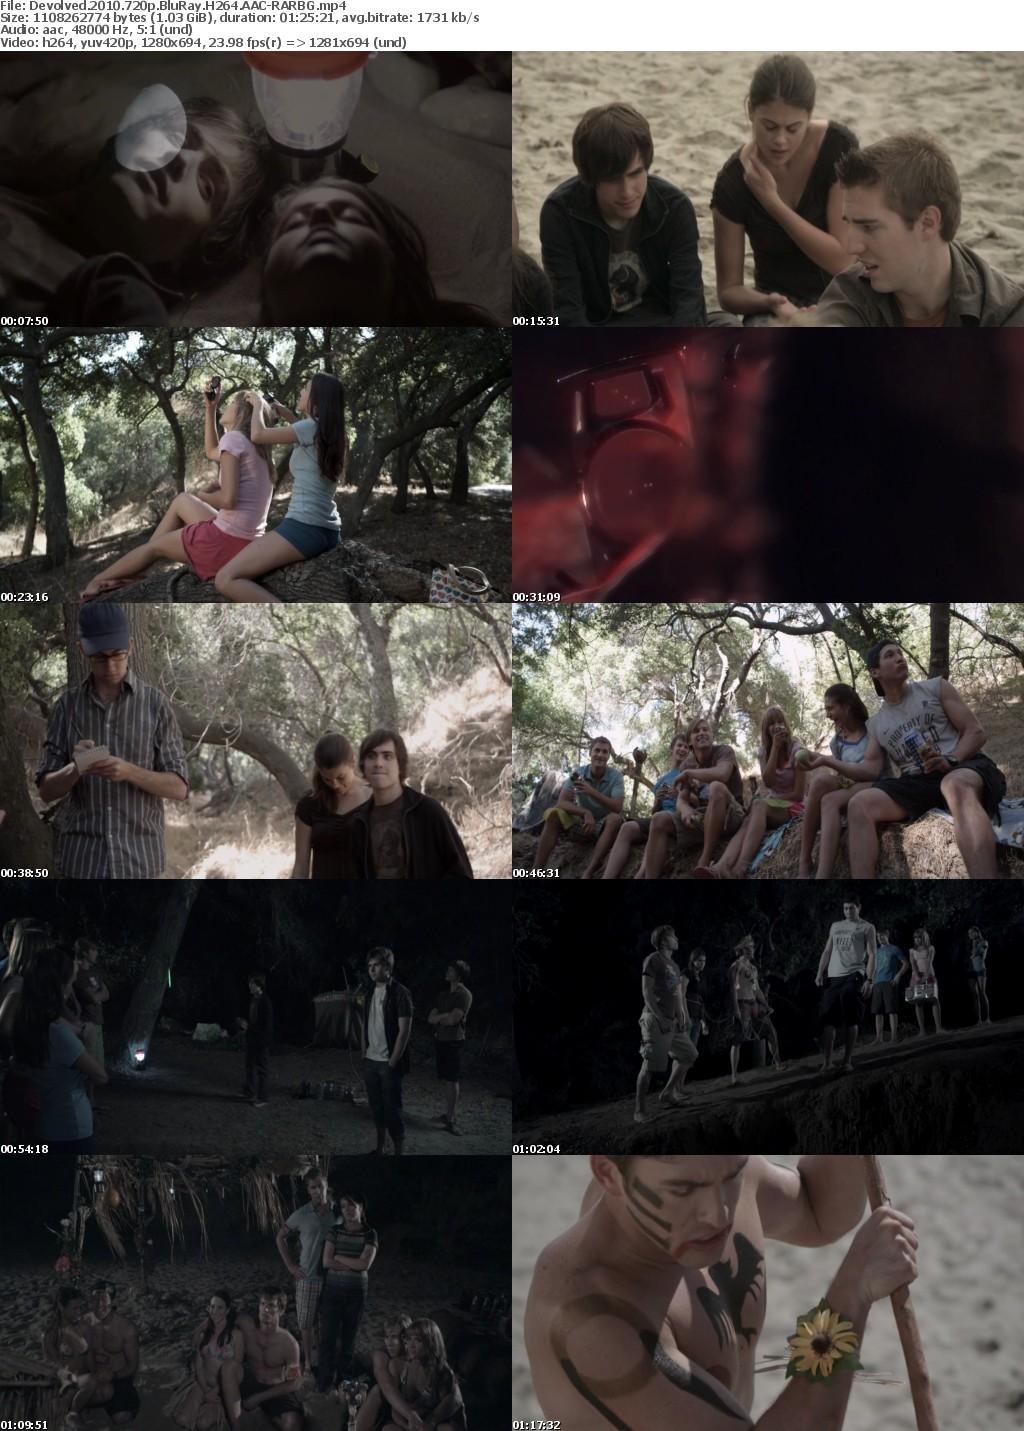 Devolved (2010) 720p BluRay H264 AAC-RARBG